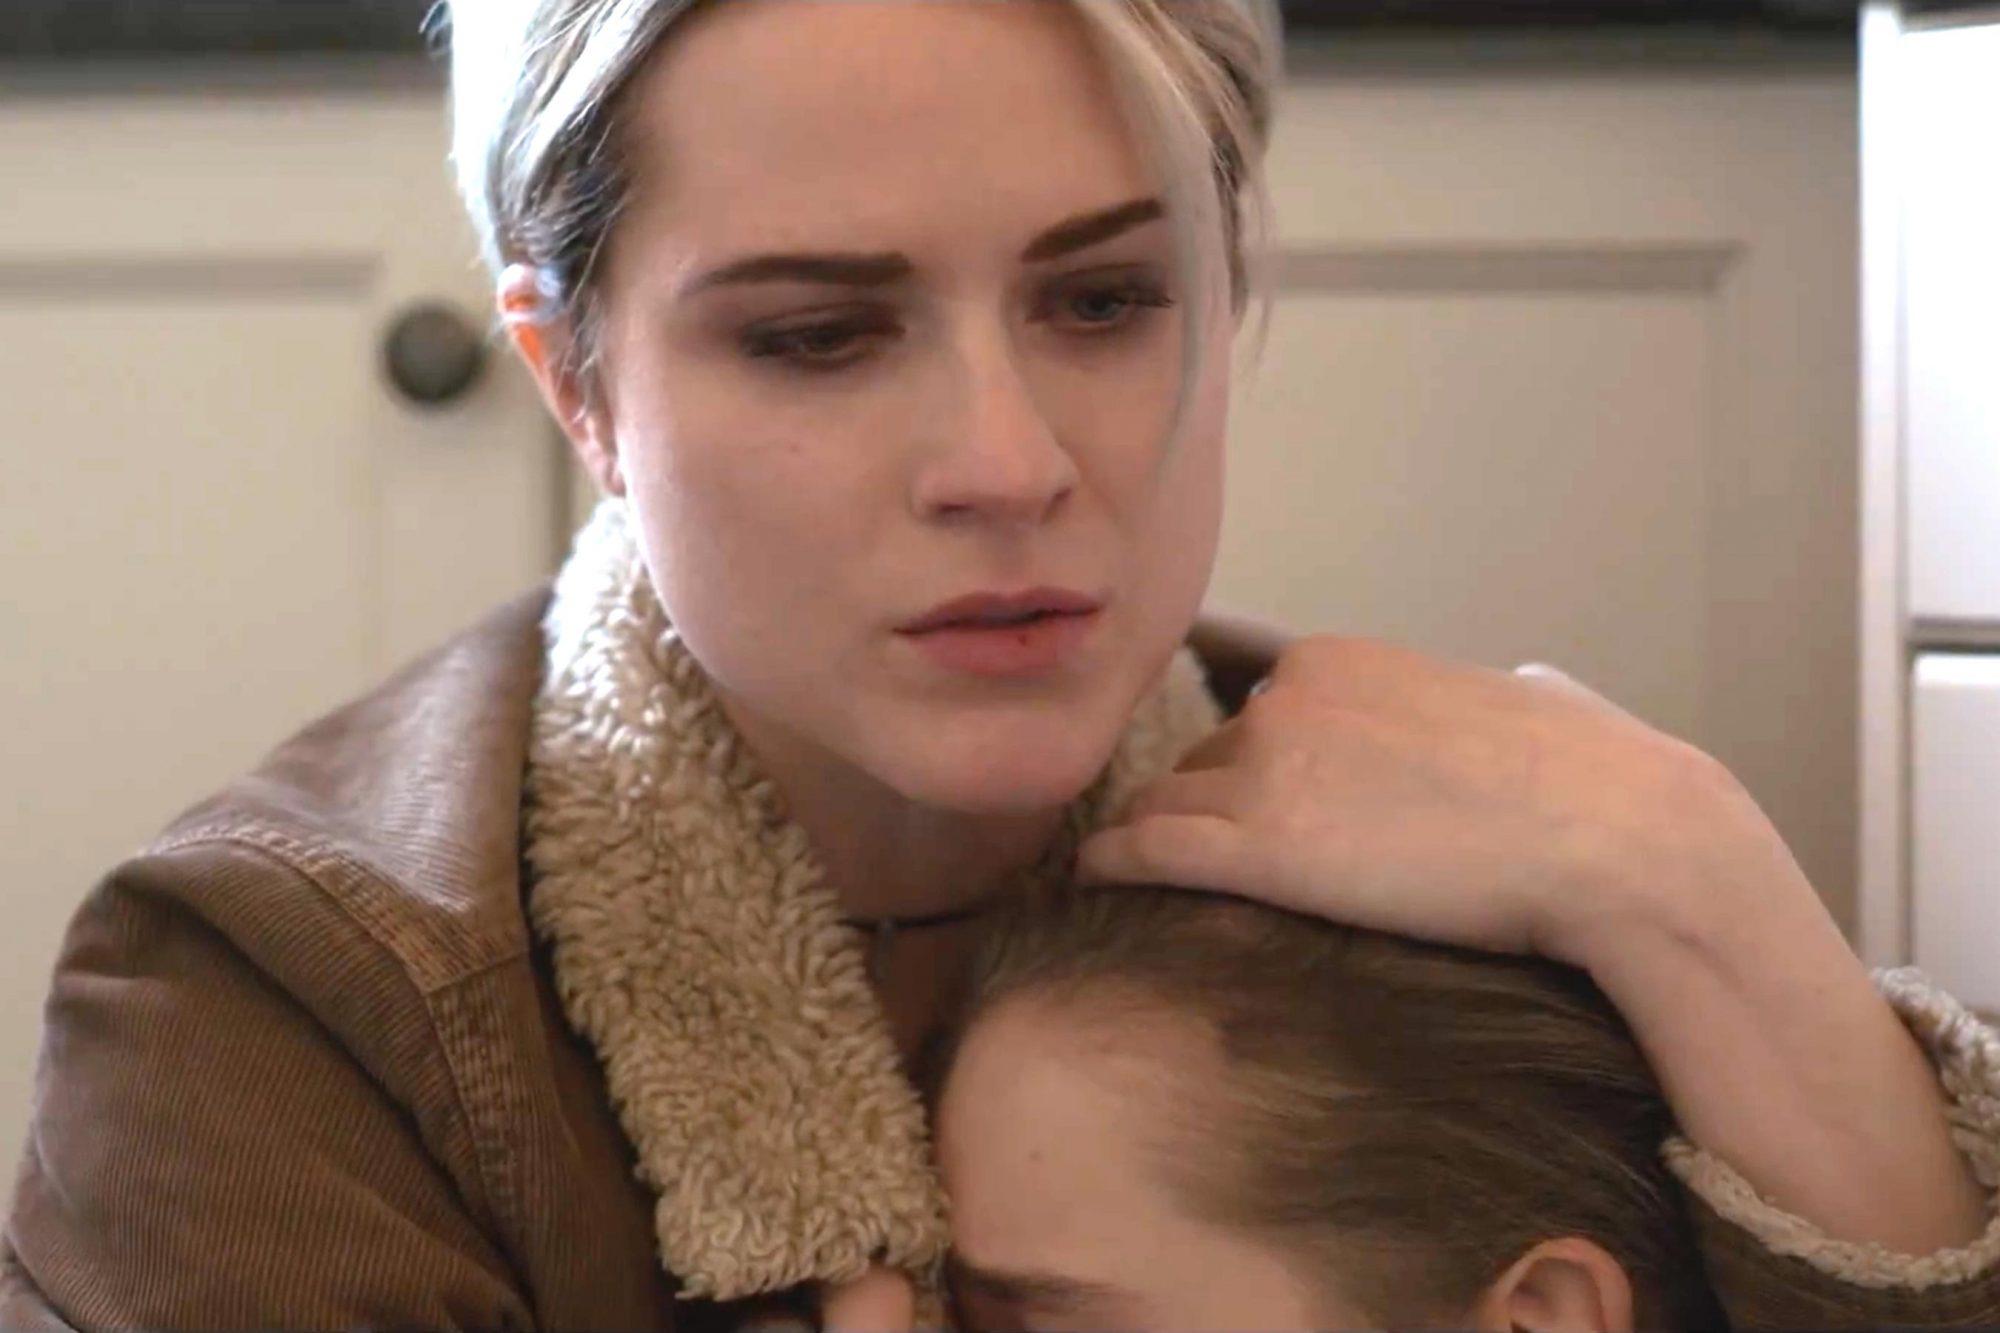 Allure (2018) -- Pictured: Laura (Evan Rachel Wood) CR: Films Seville